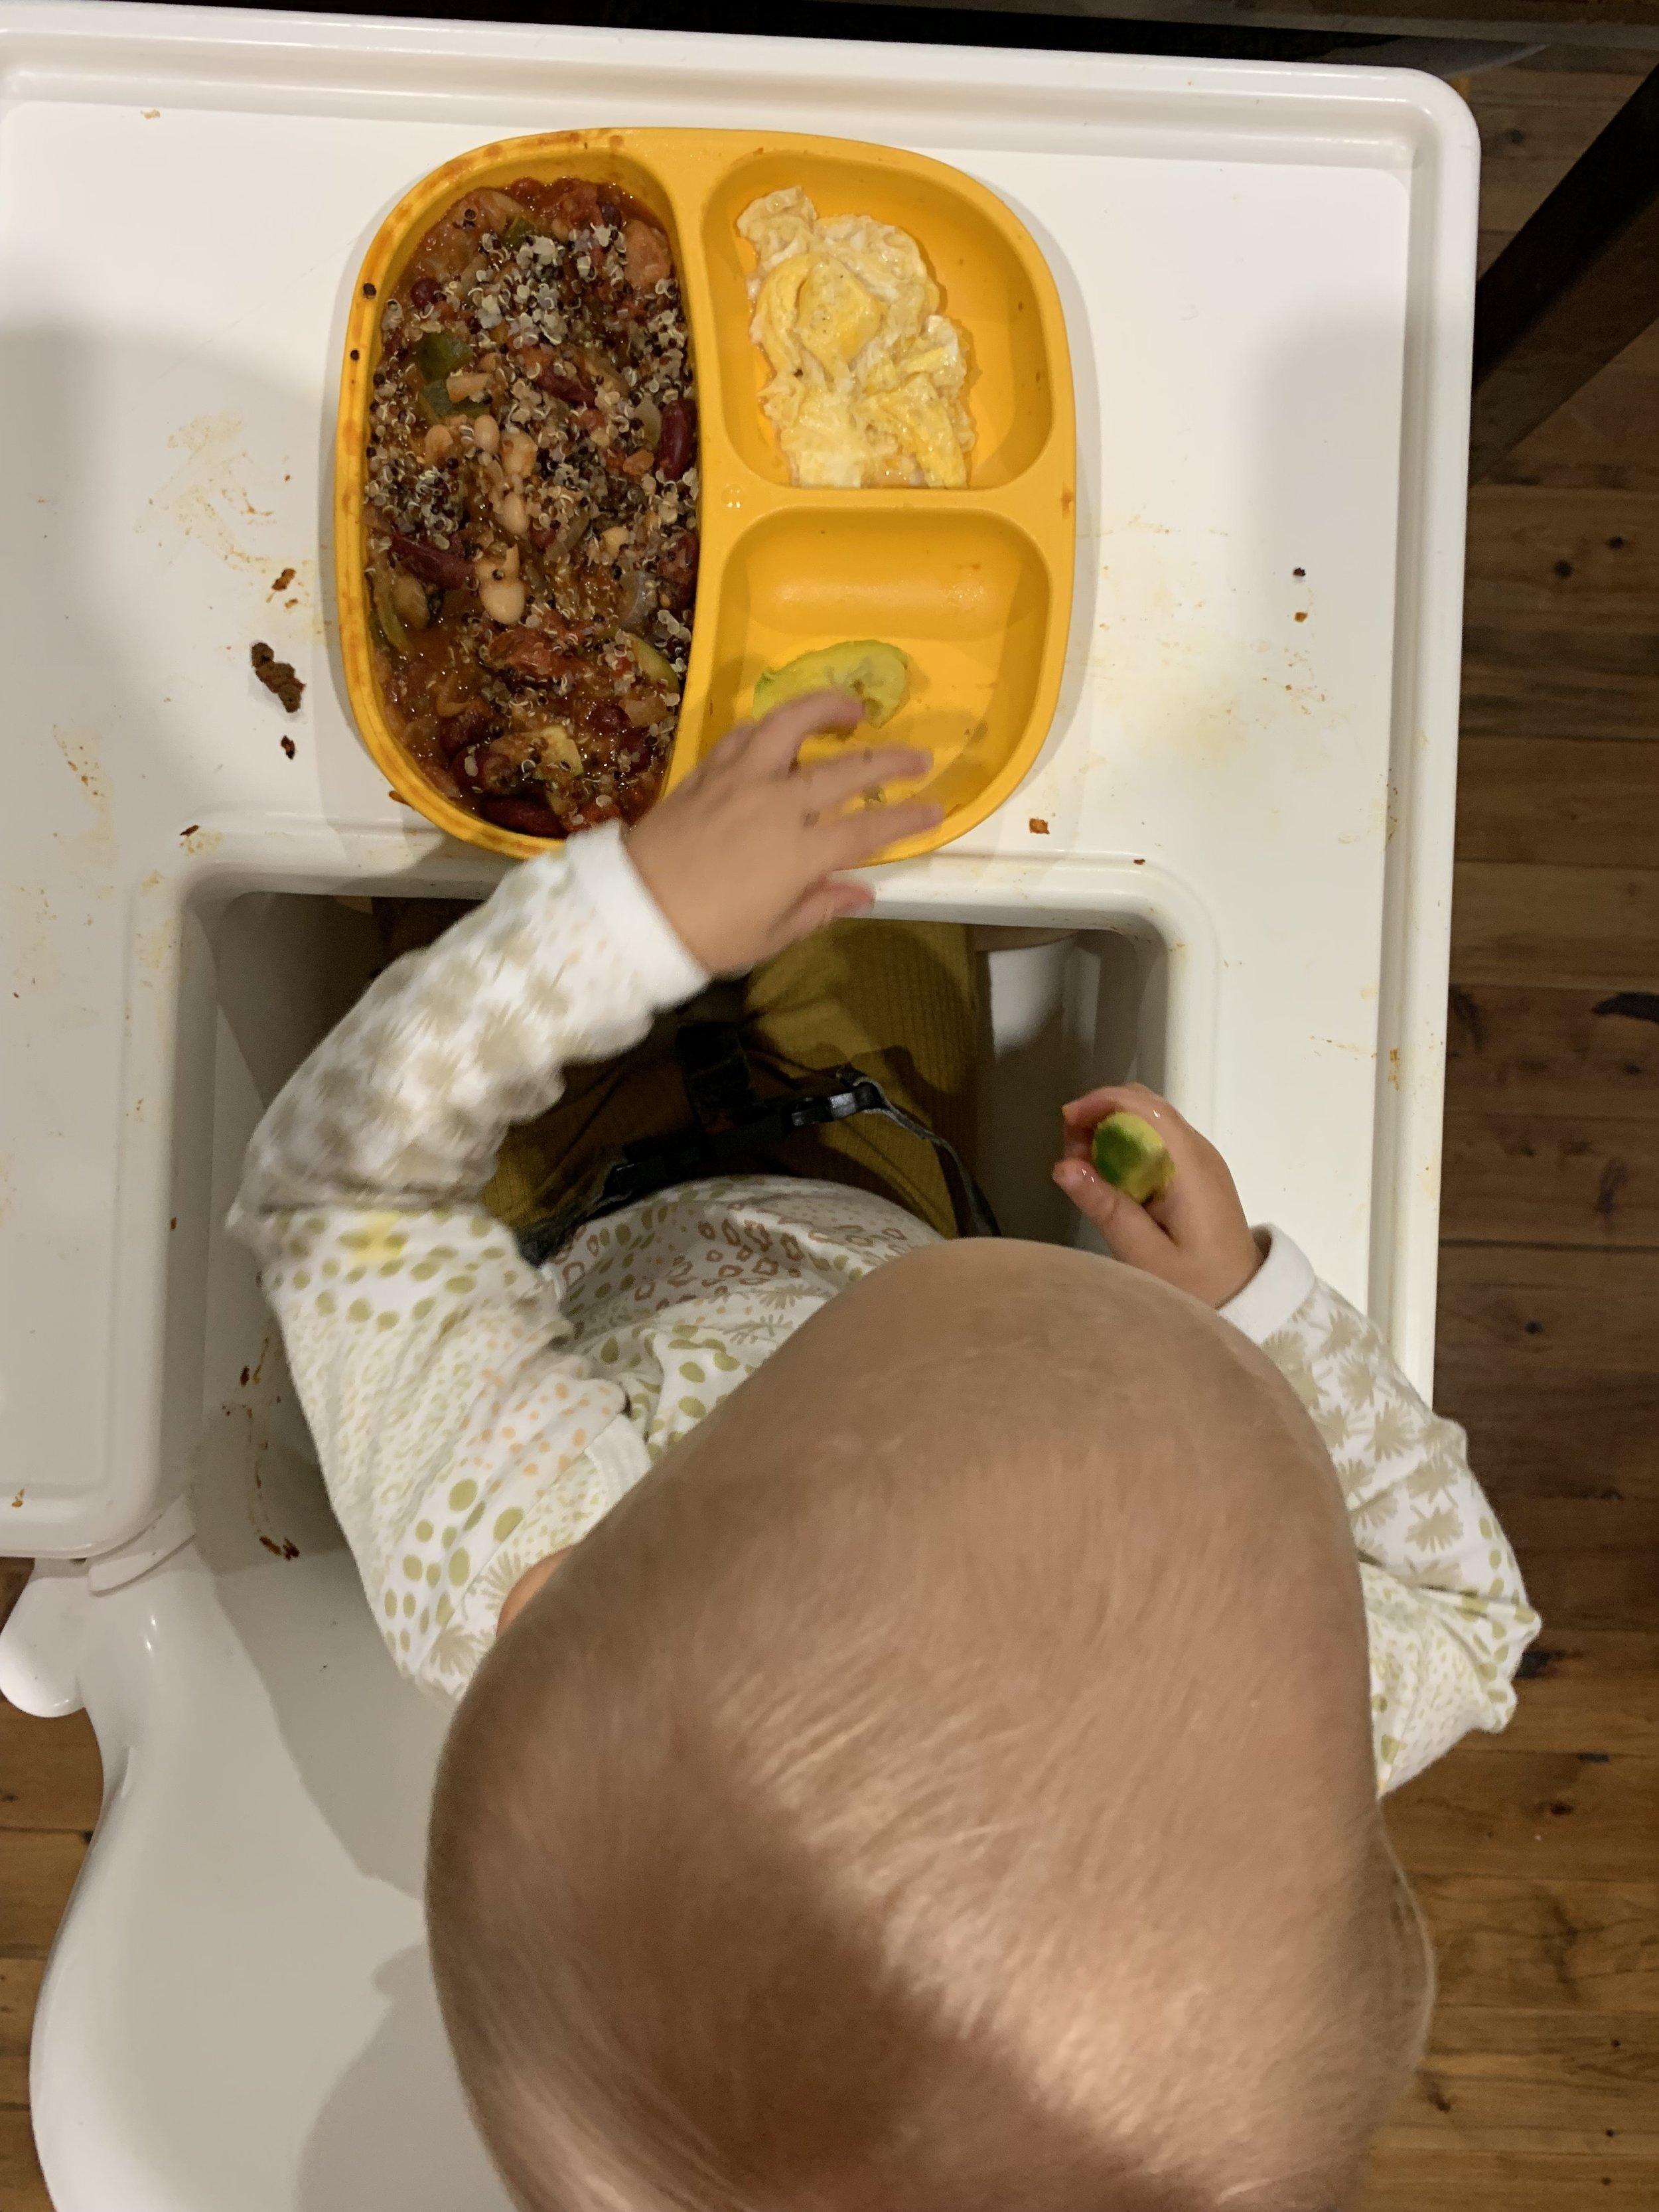 blw quinoa, beans and turmeric eggs